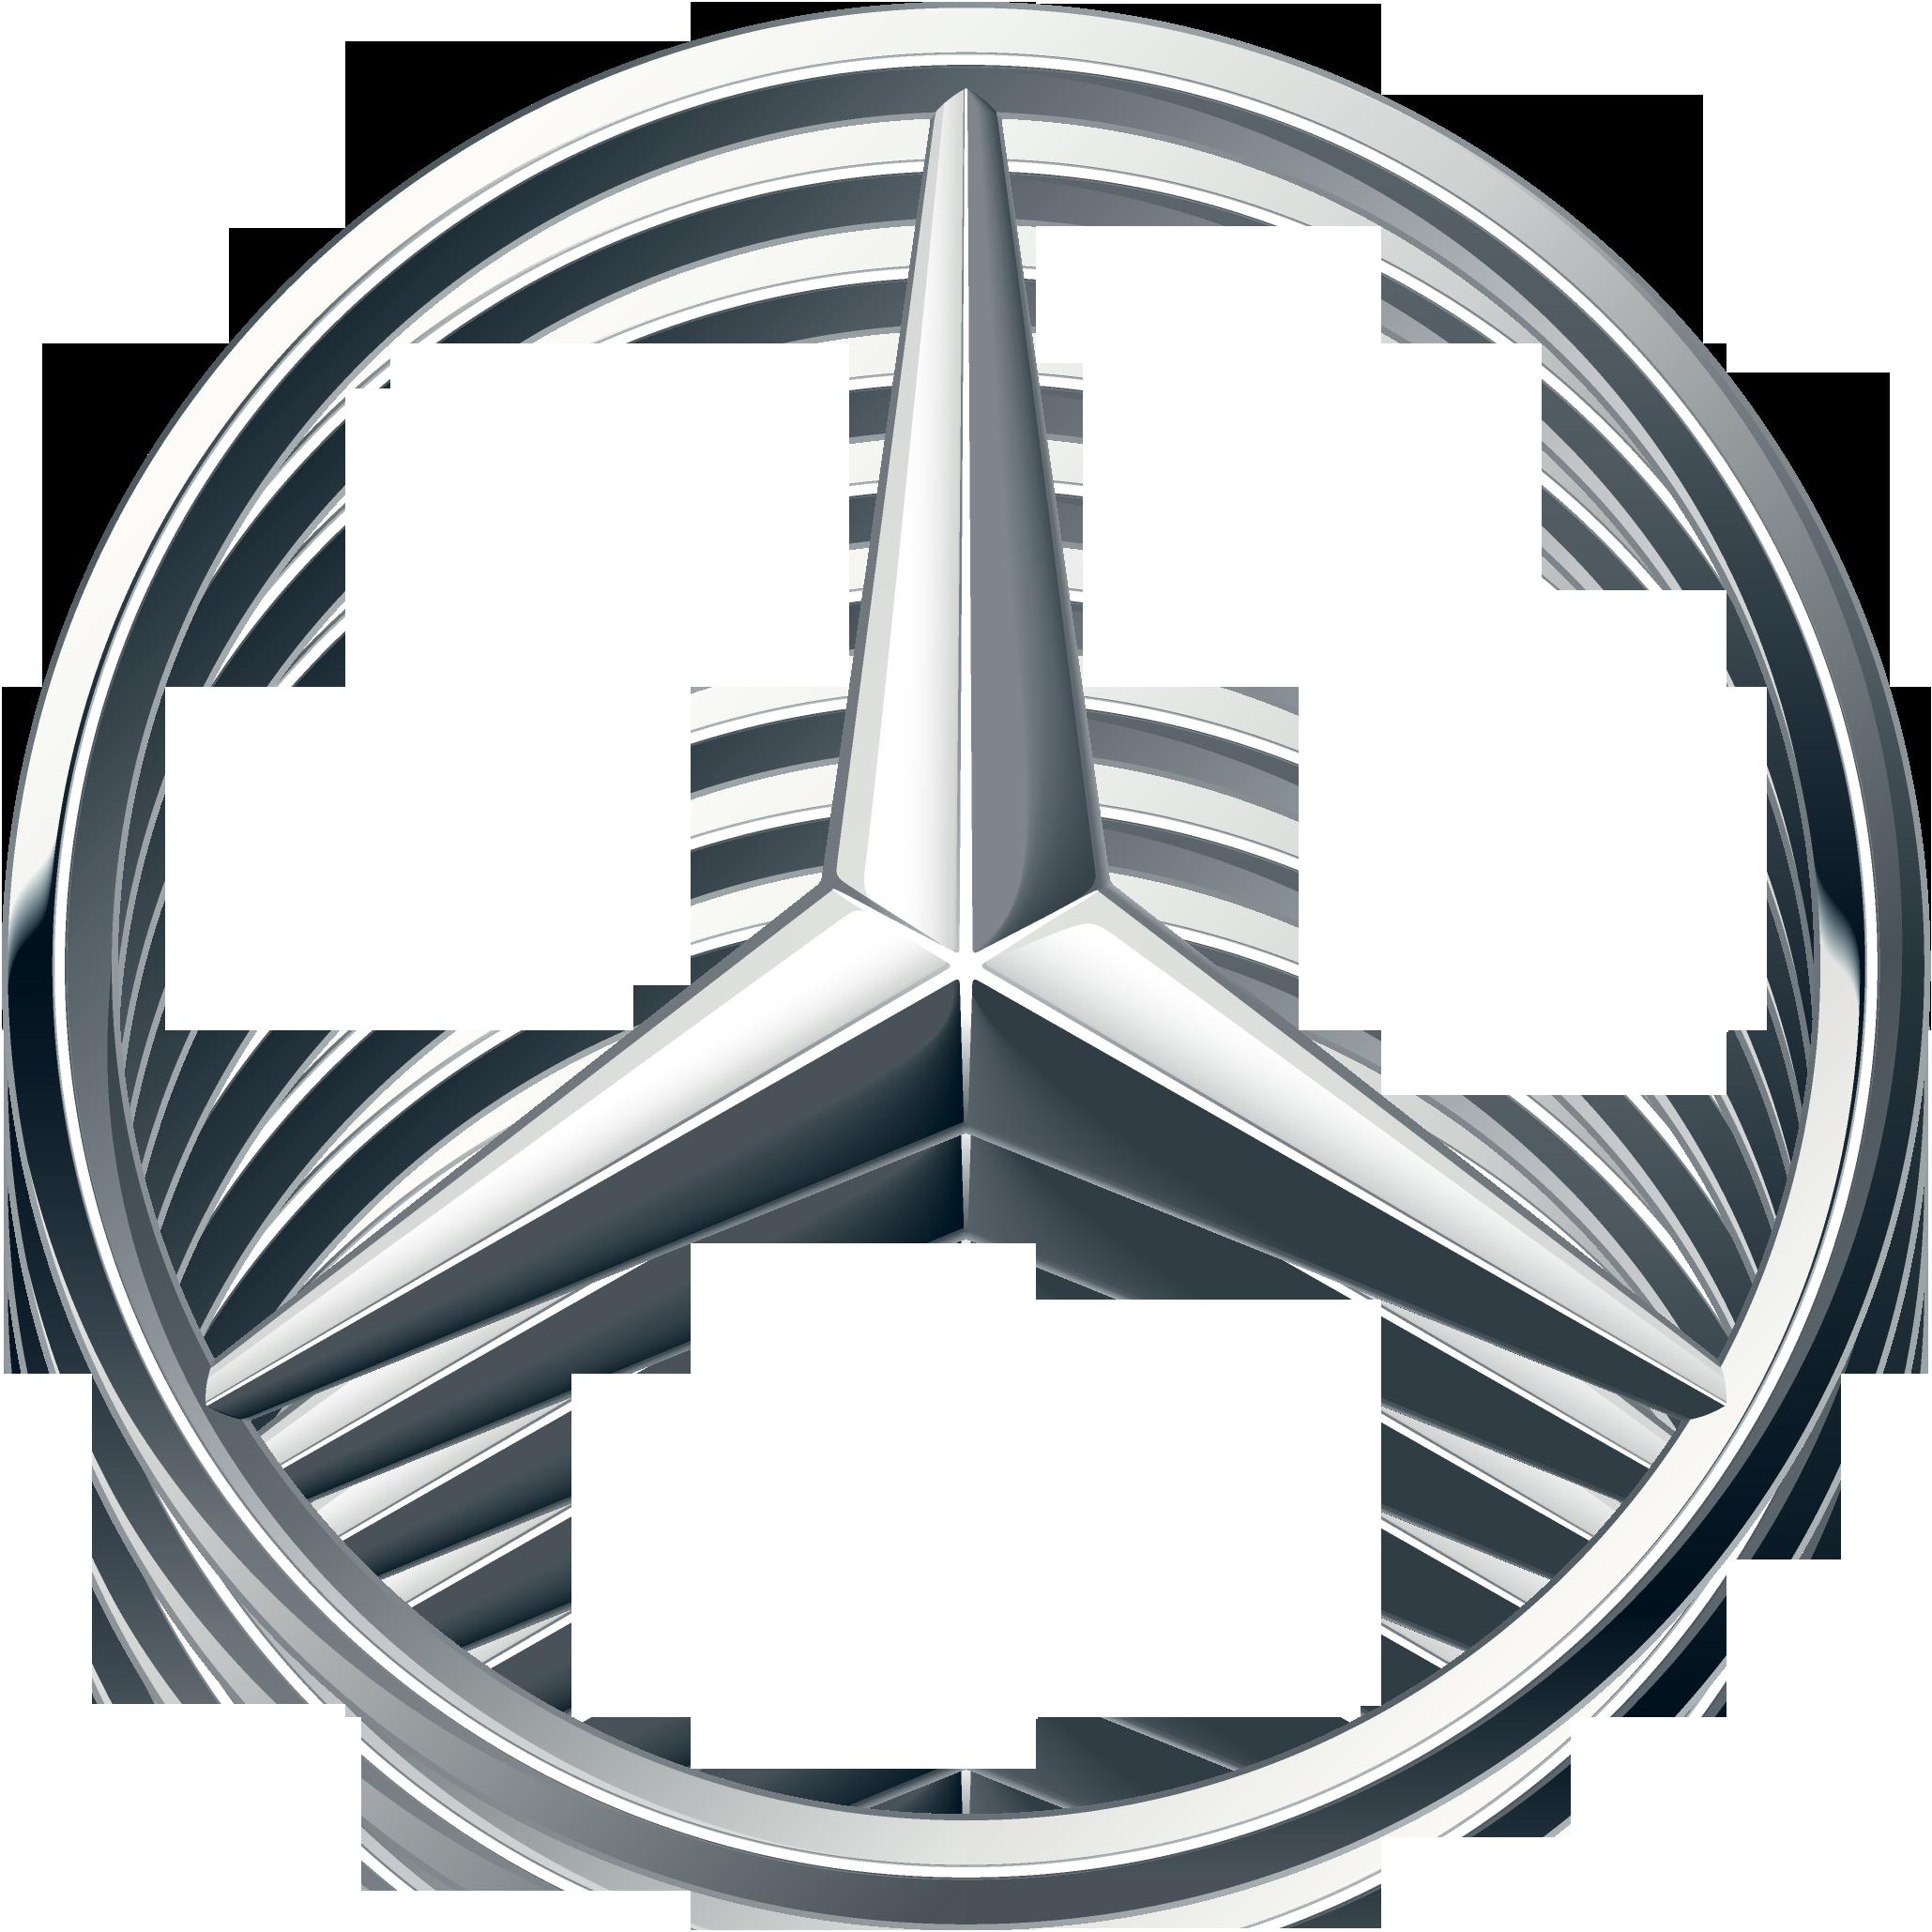 mitglieder-logos/1000000244_MB-star_L_3Coffice.png